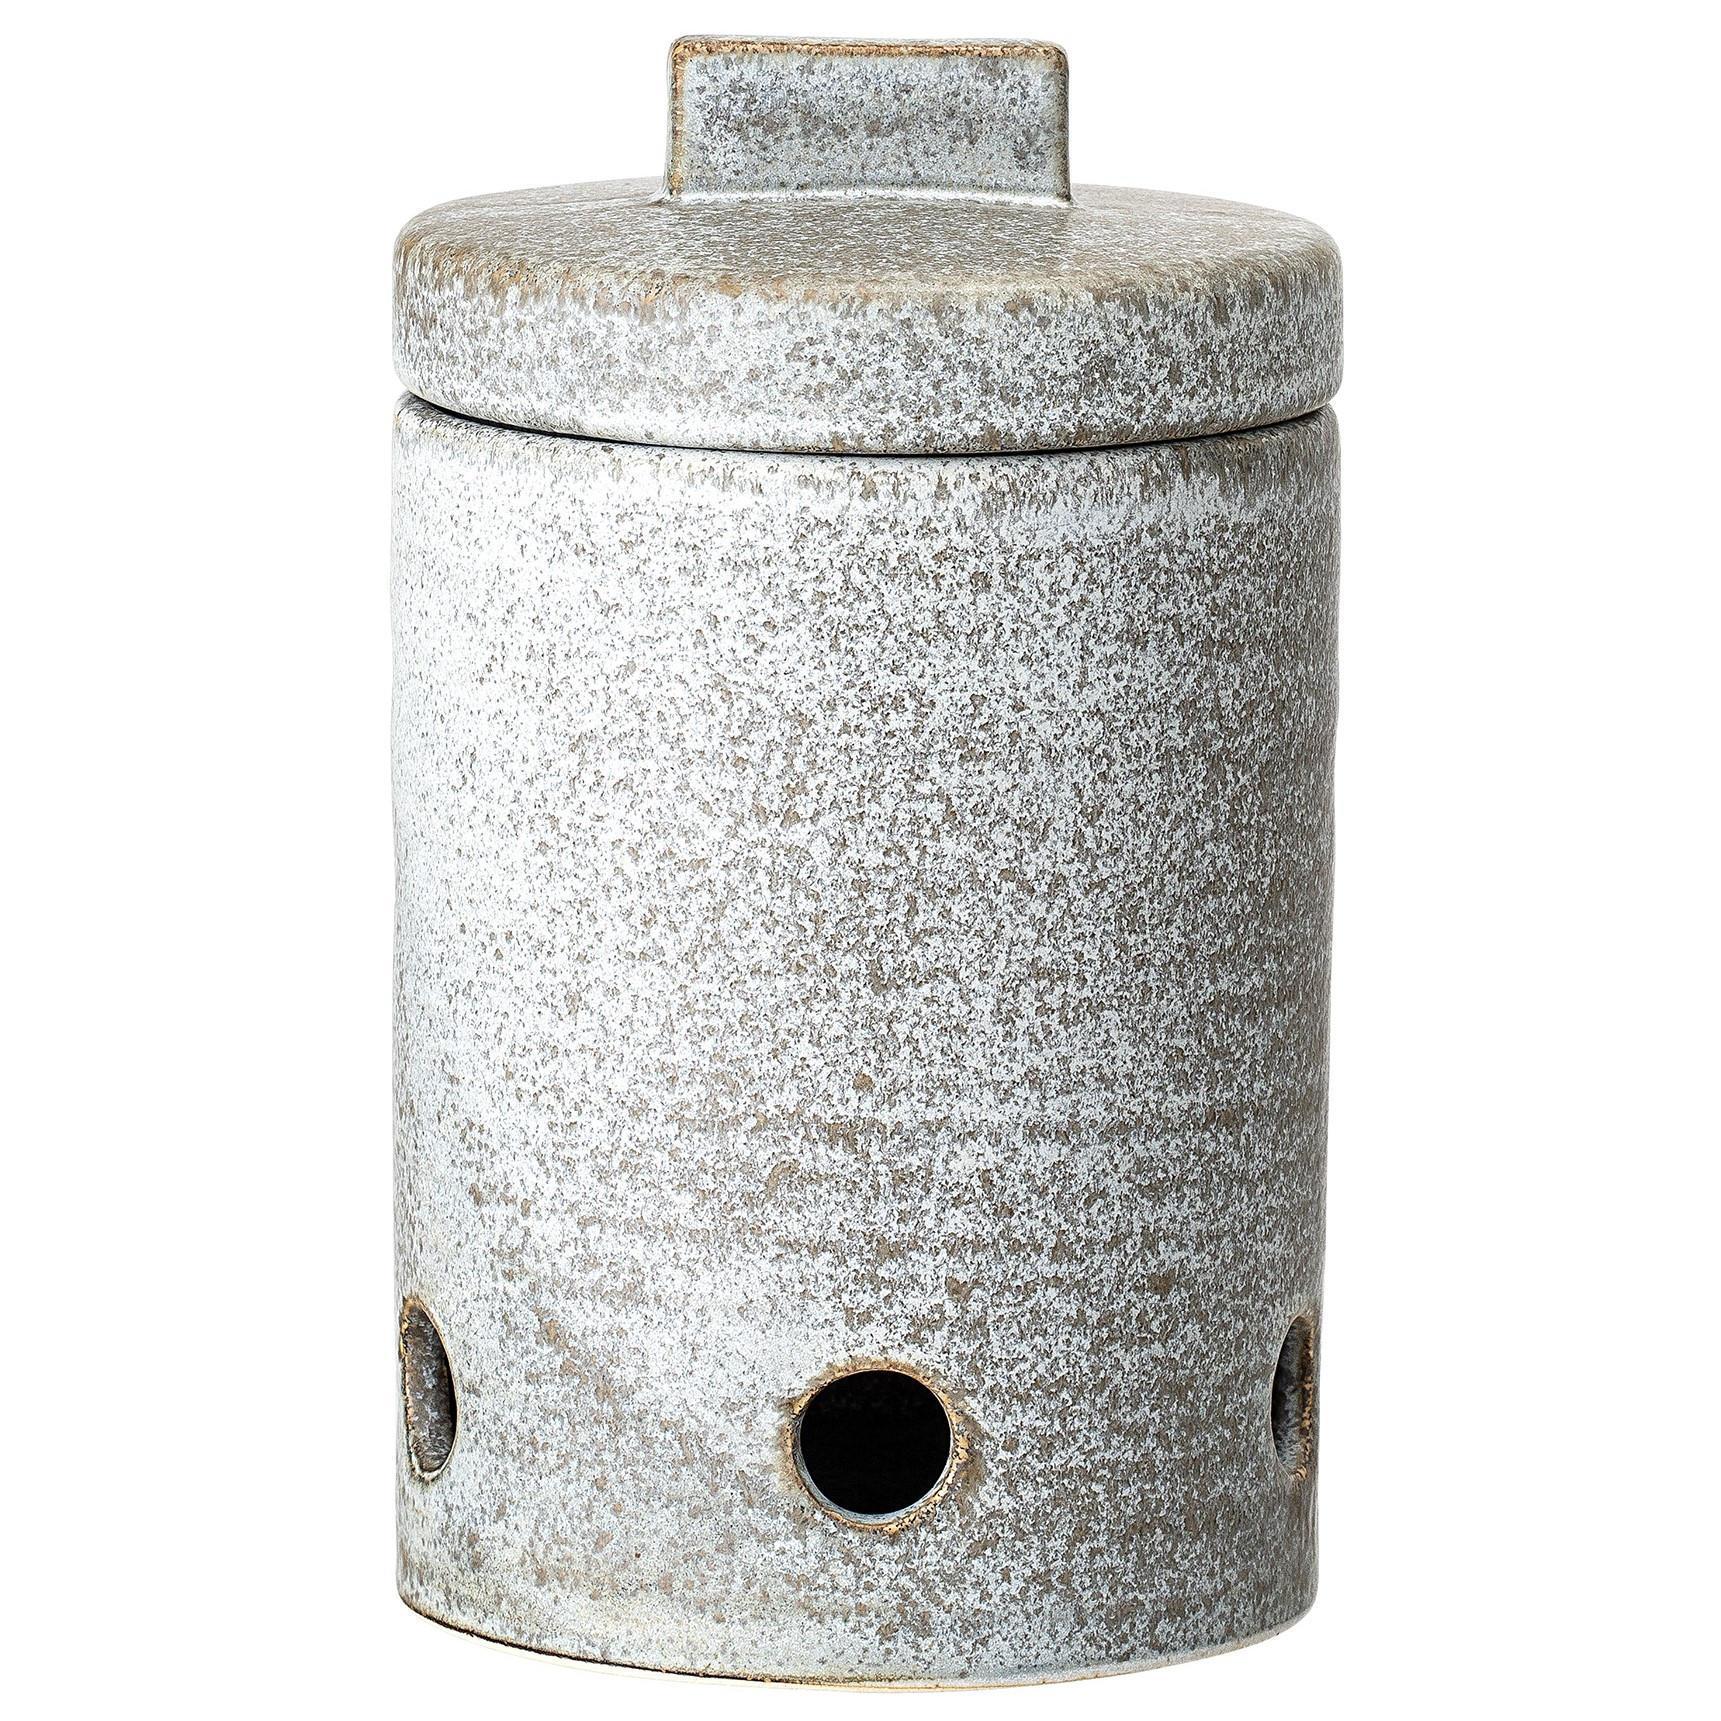 Bloomingville Keramická nádoba na česnek Kendra Garlic Jar, šedá barva, keramika